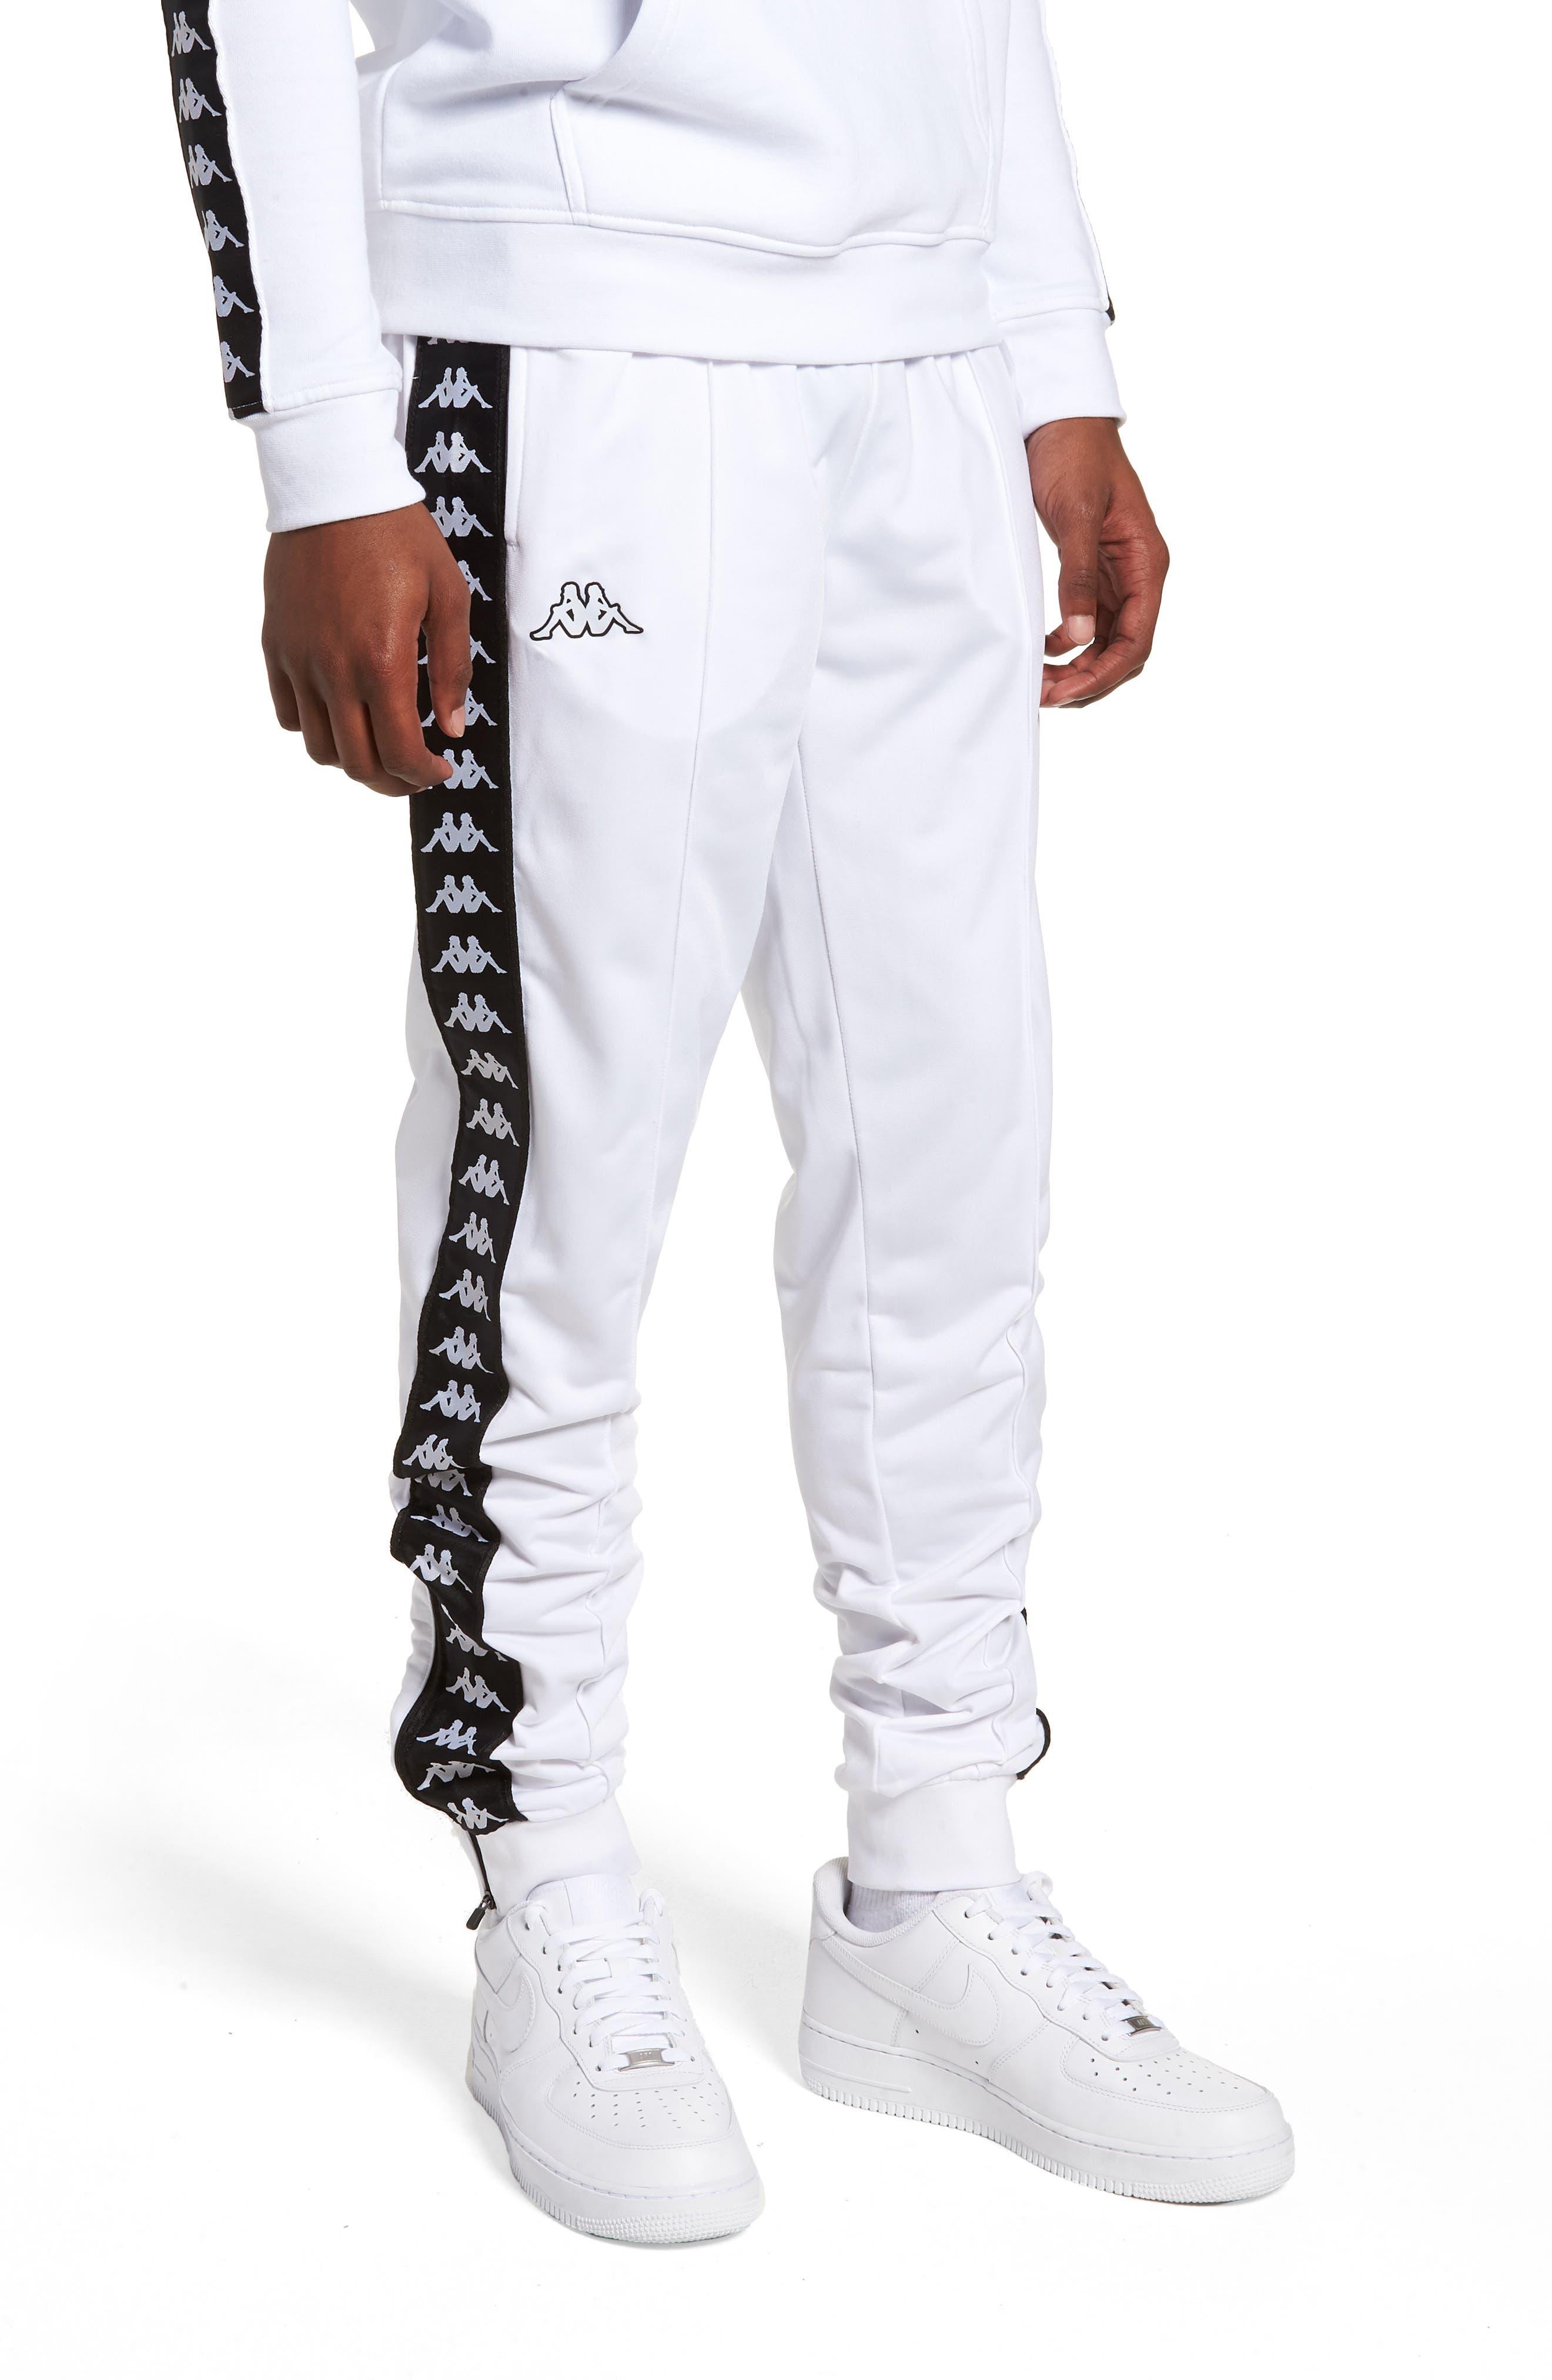 Active Banded Track Pants,                             Main thumbnail 1, color,                             White/ Black